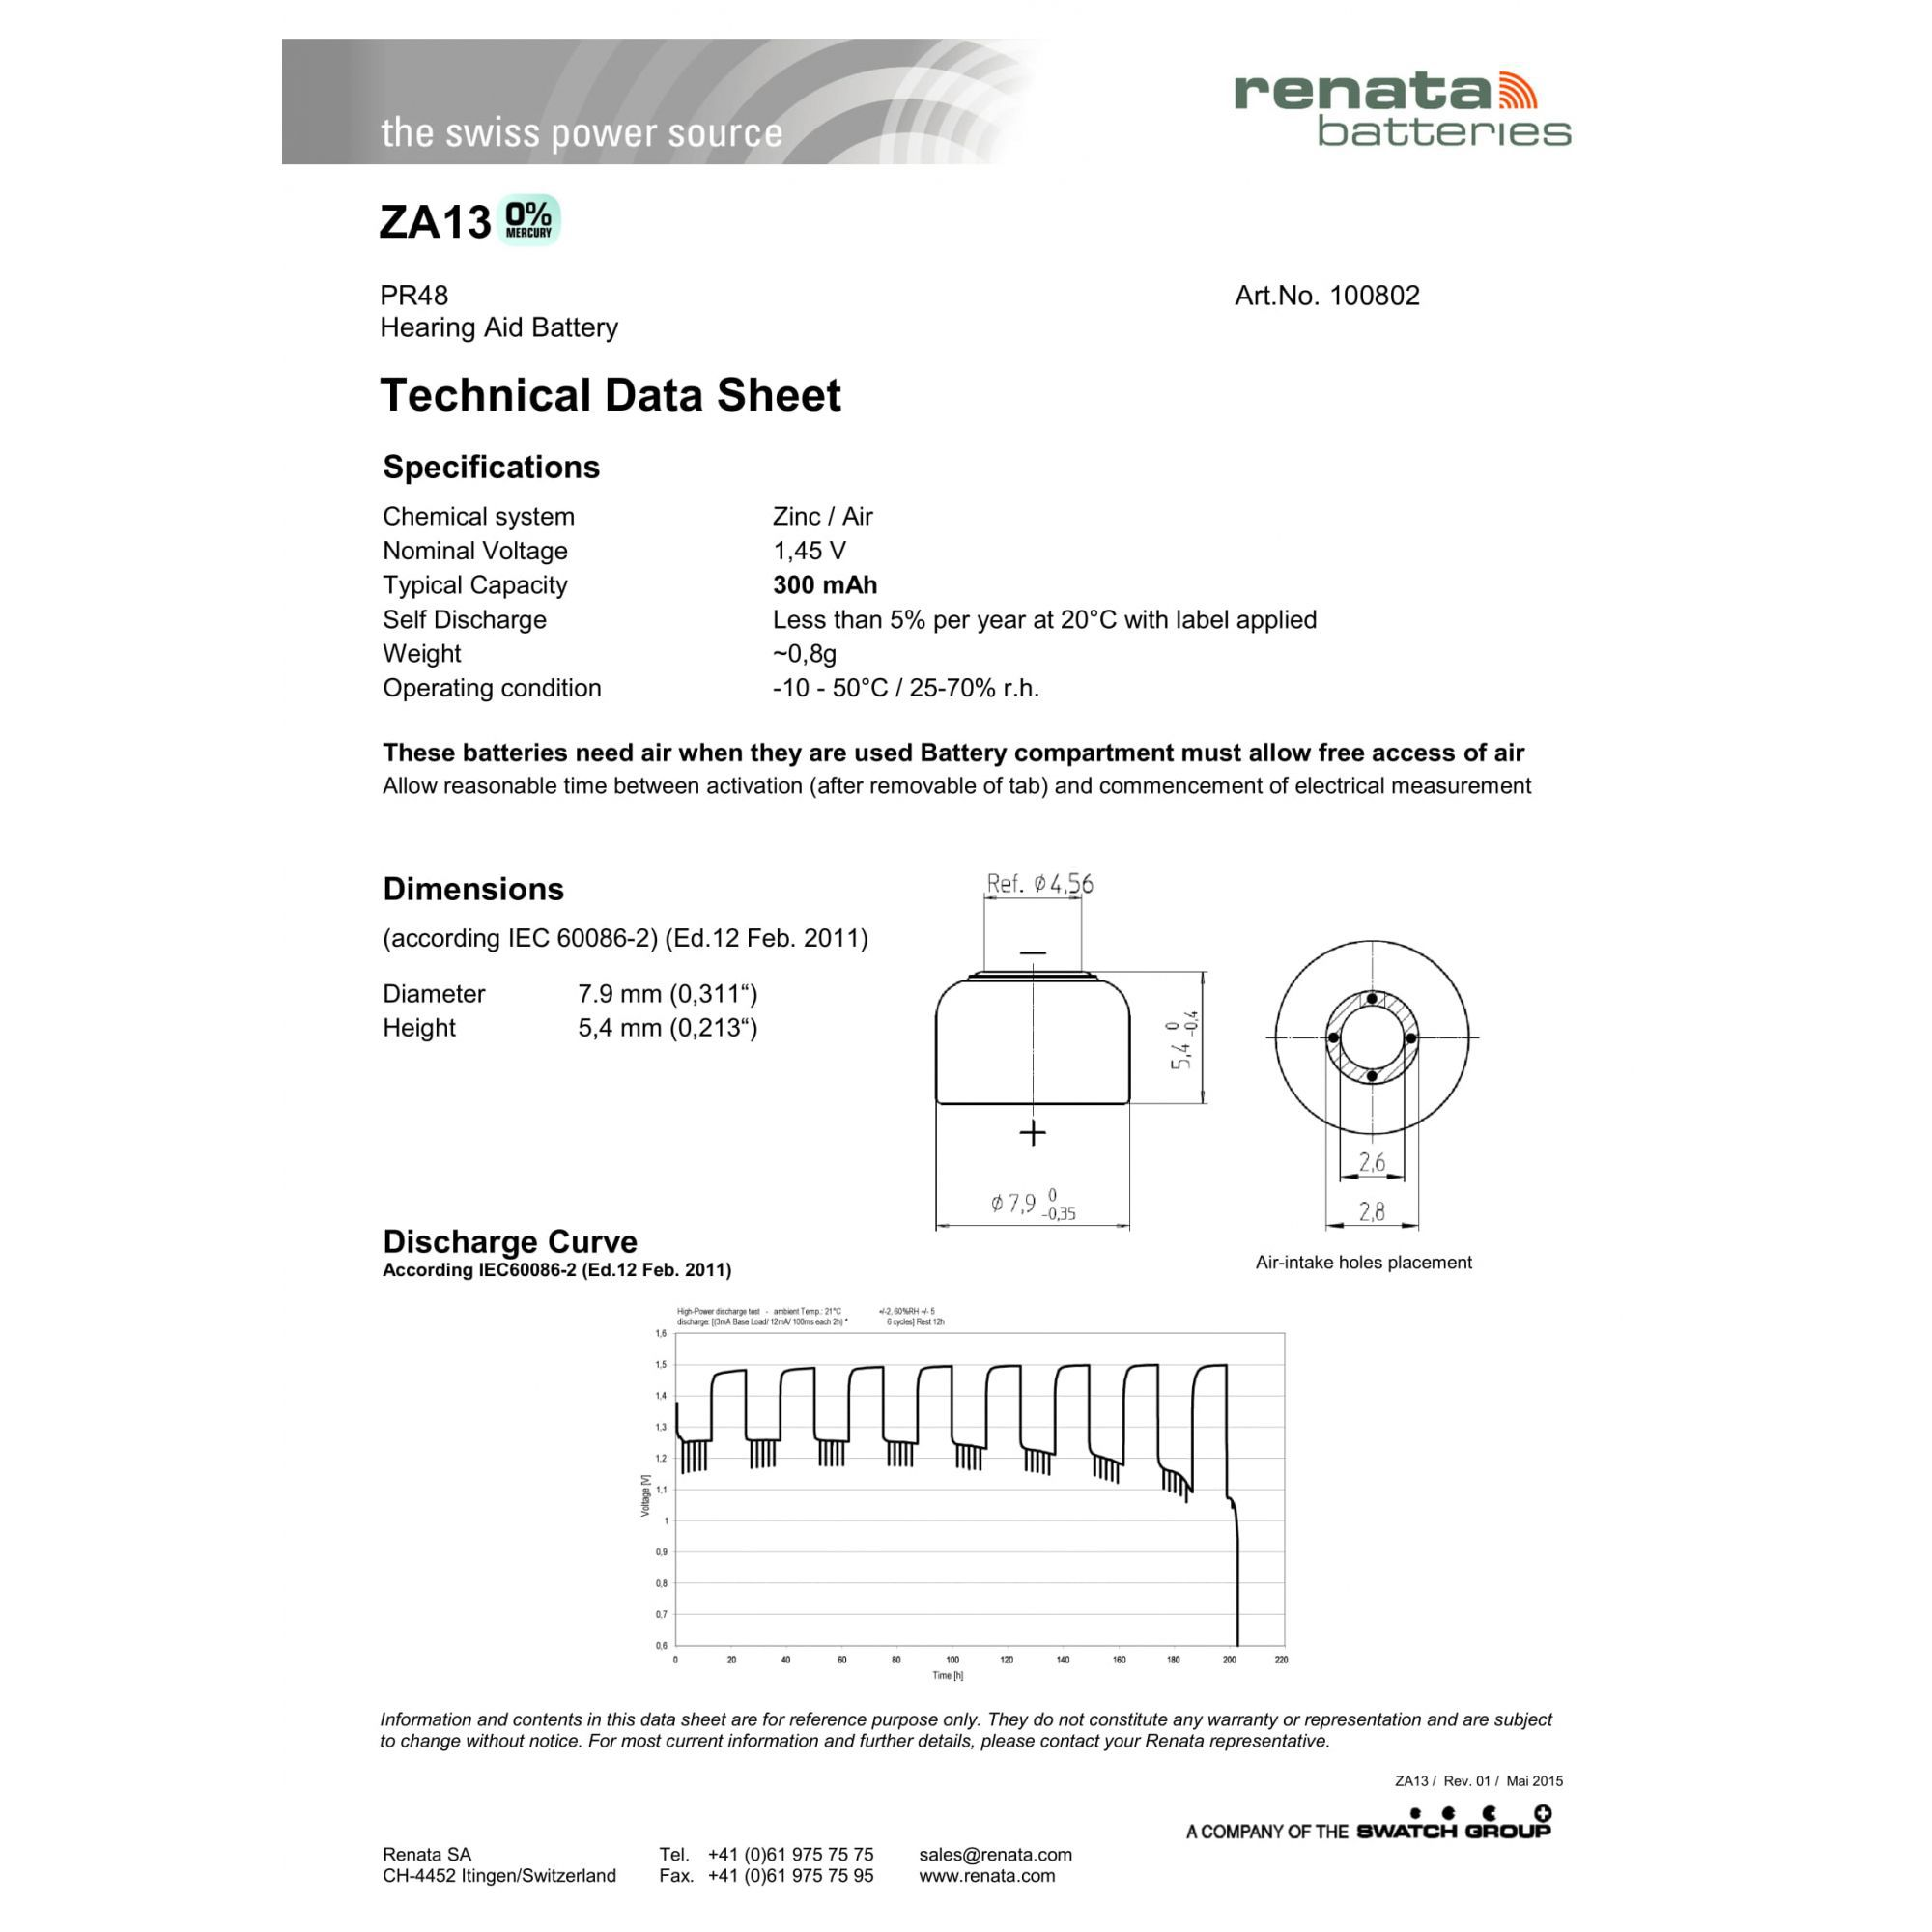 60 Baterias Pilhas Auditiva 13 RENATA ZA13  - 10 cartelas